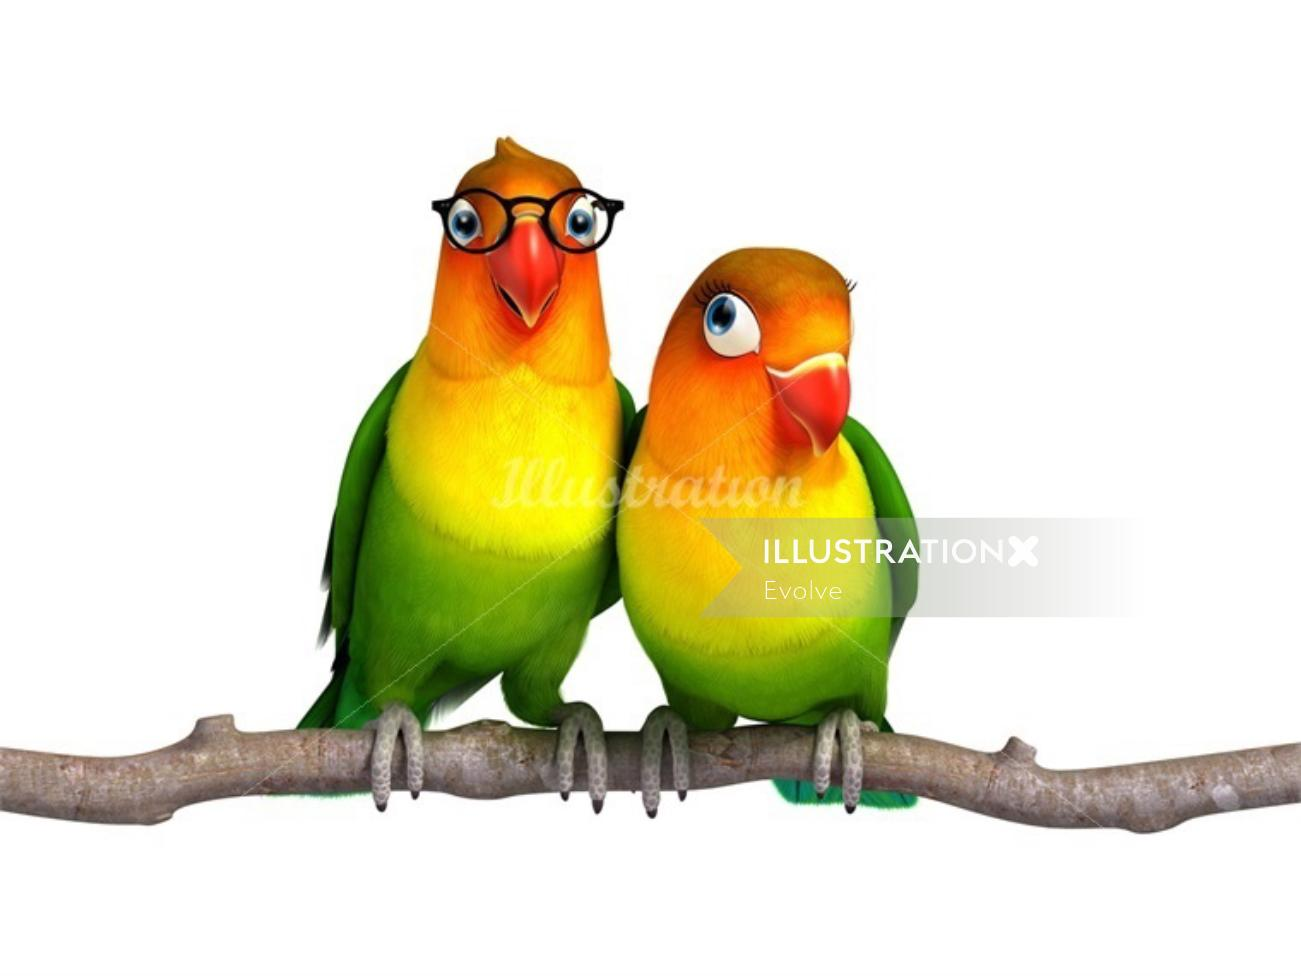 Illustration of parrots